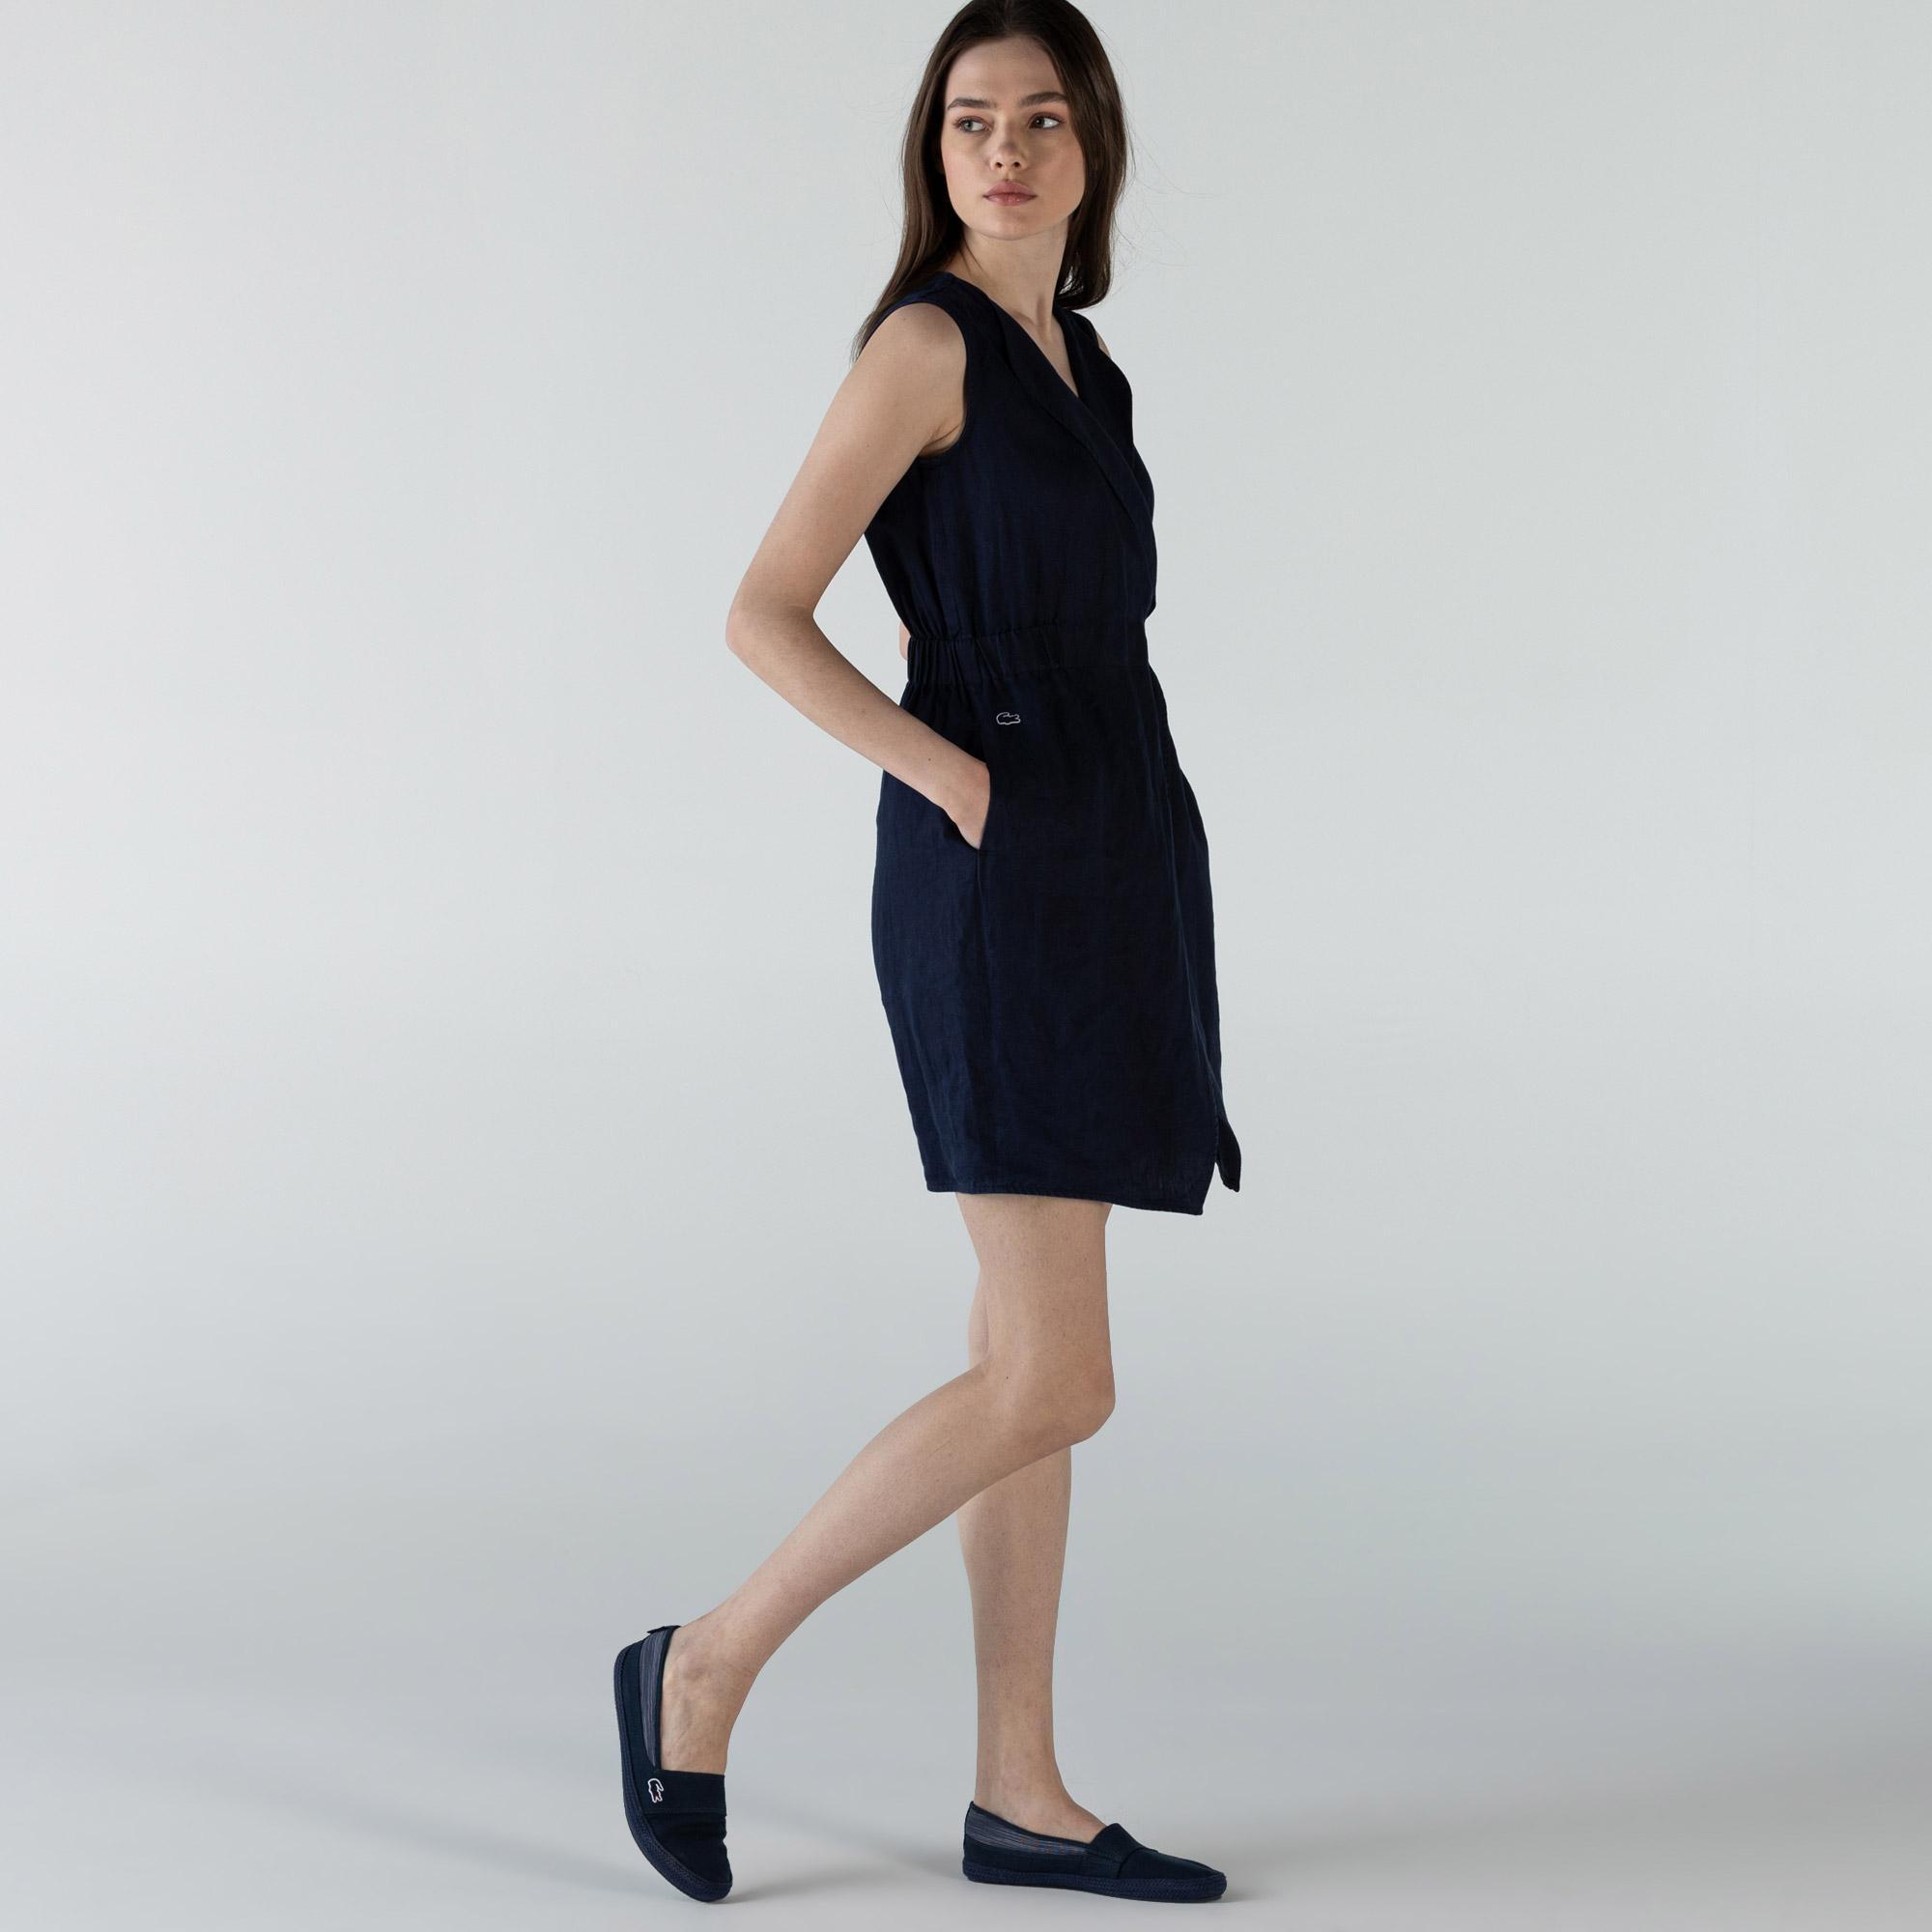 Lacoste Kadın Kruvaze Kolsuz Lacivert Keten Elbise